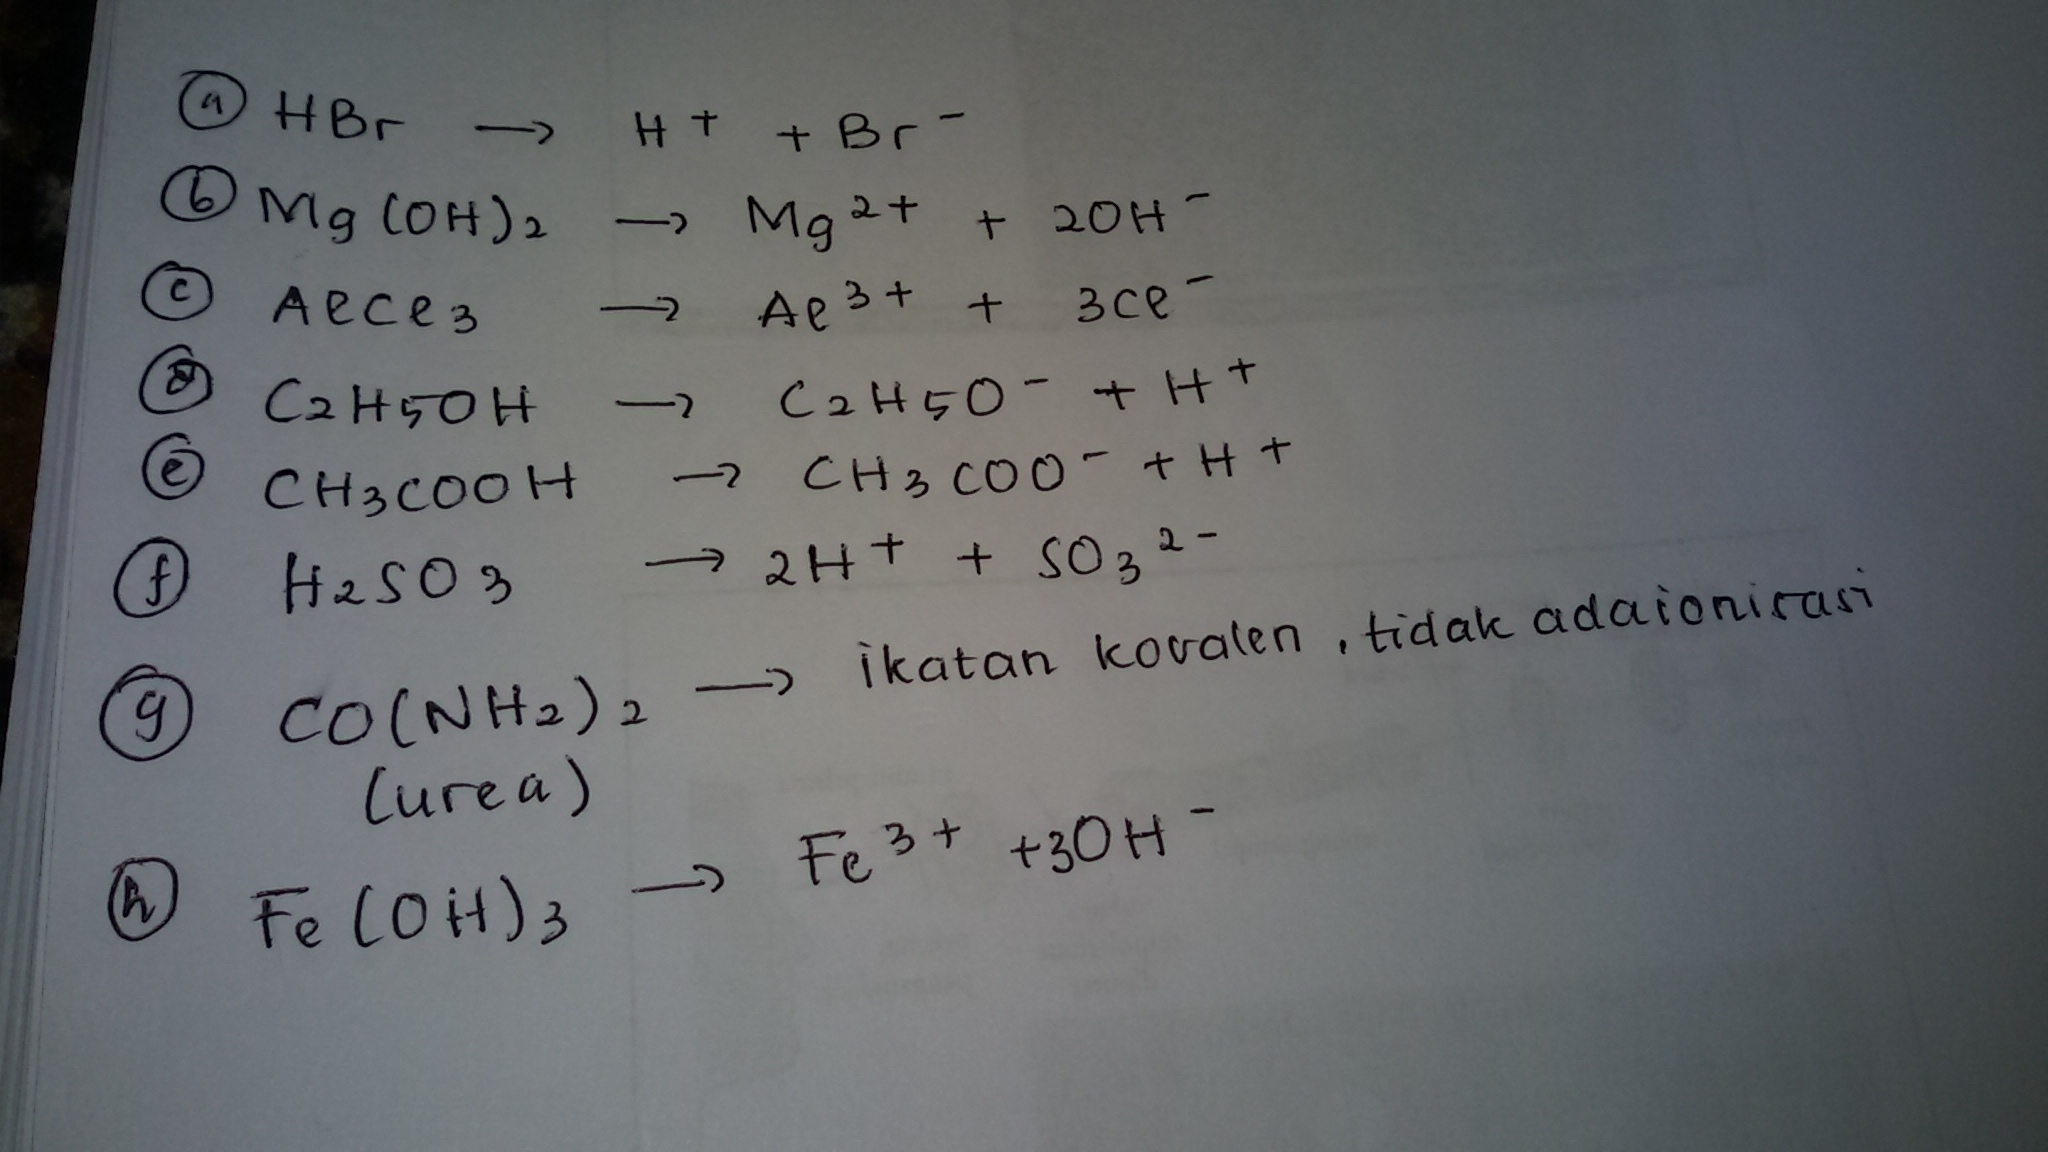 HBr, Mg(OH)2, AlCl3, C2H5OH, CH3COOH, H2SO3, CO(NH2)2, dan ...